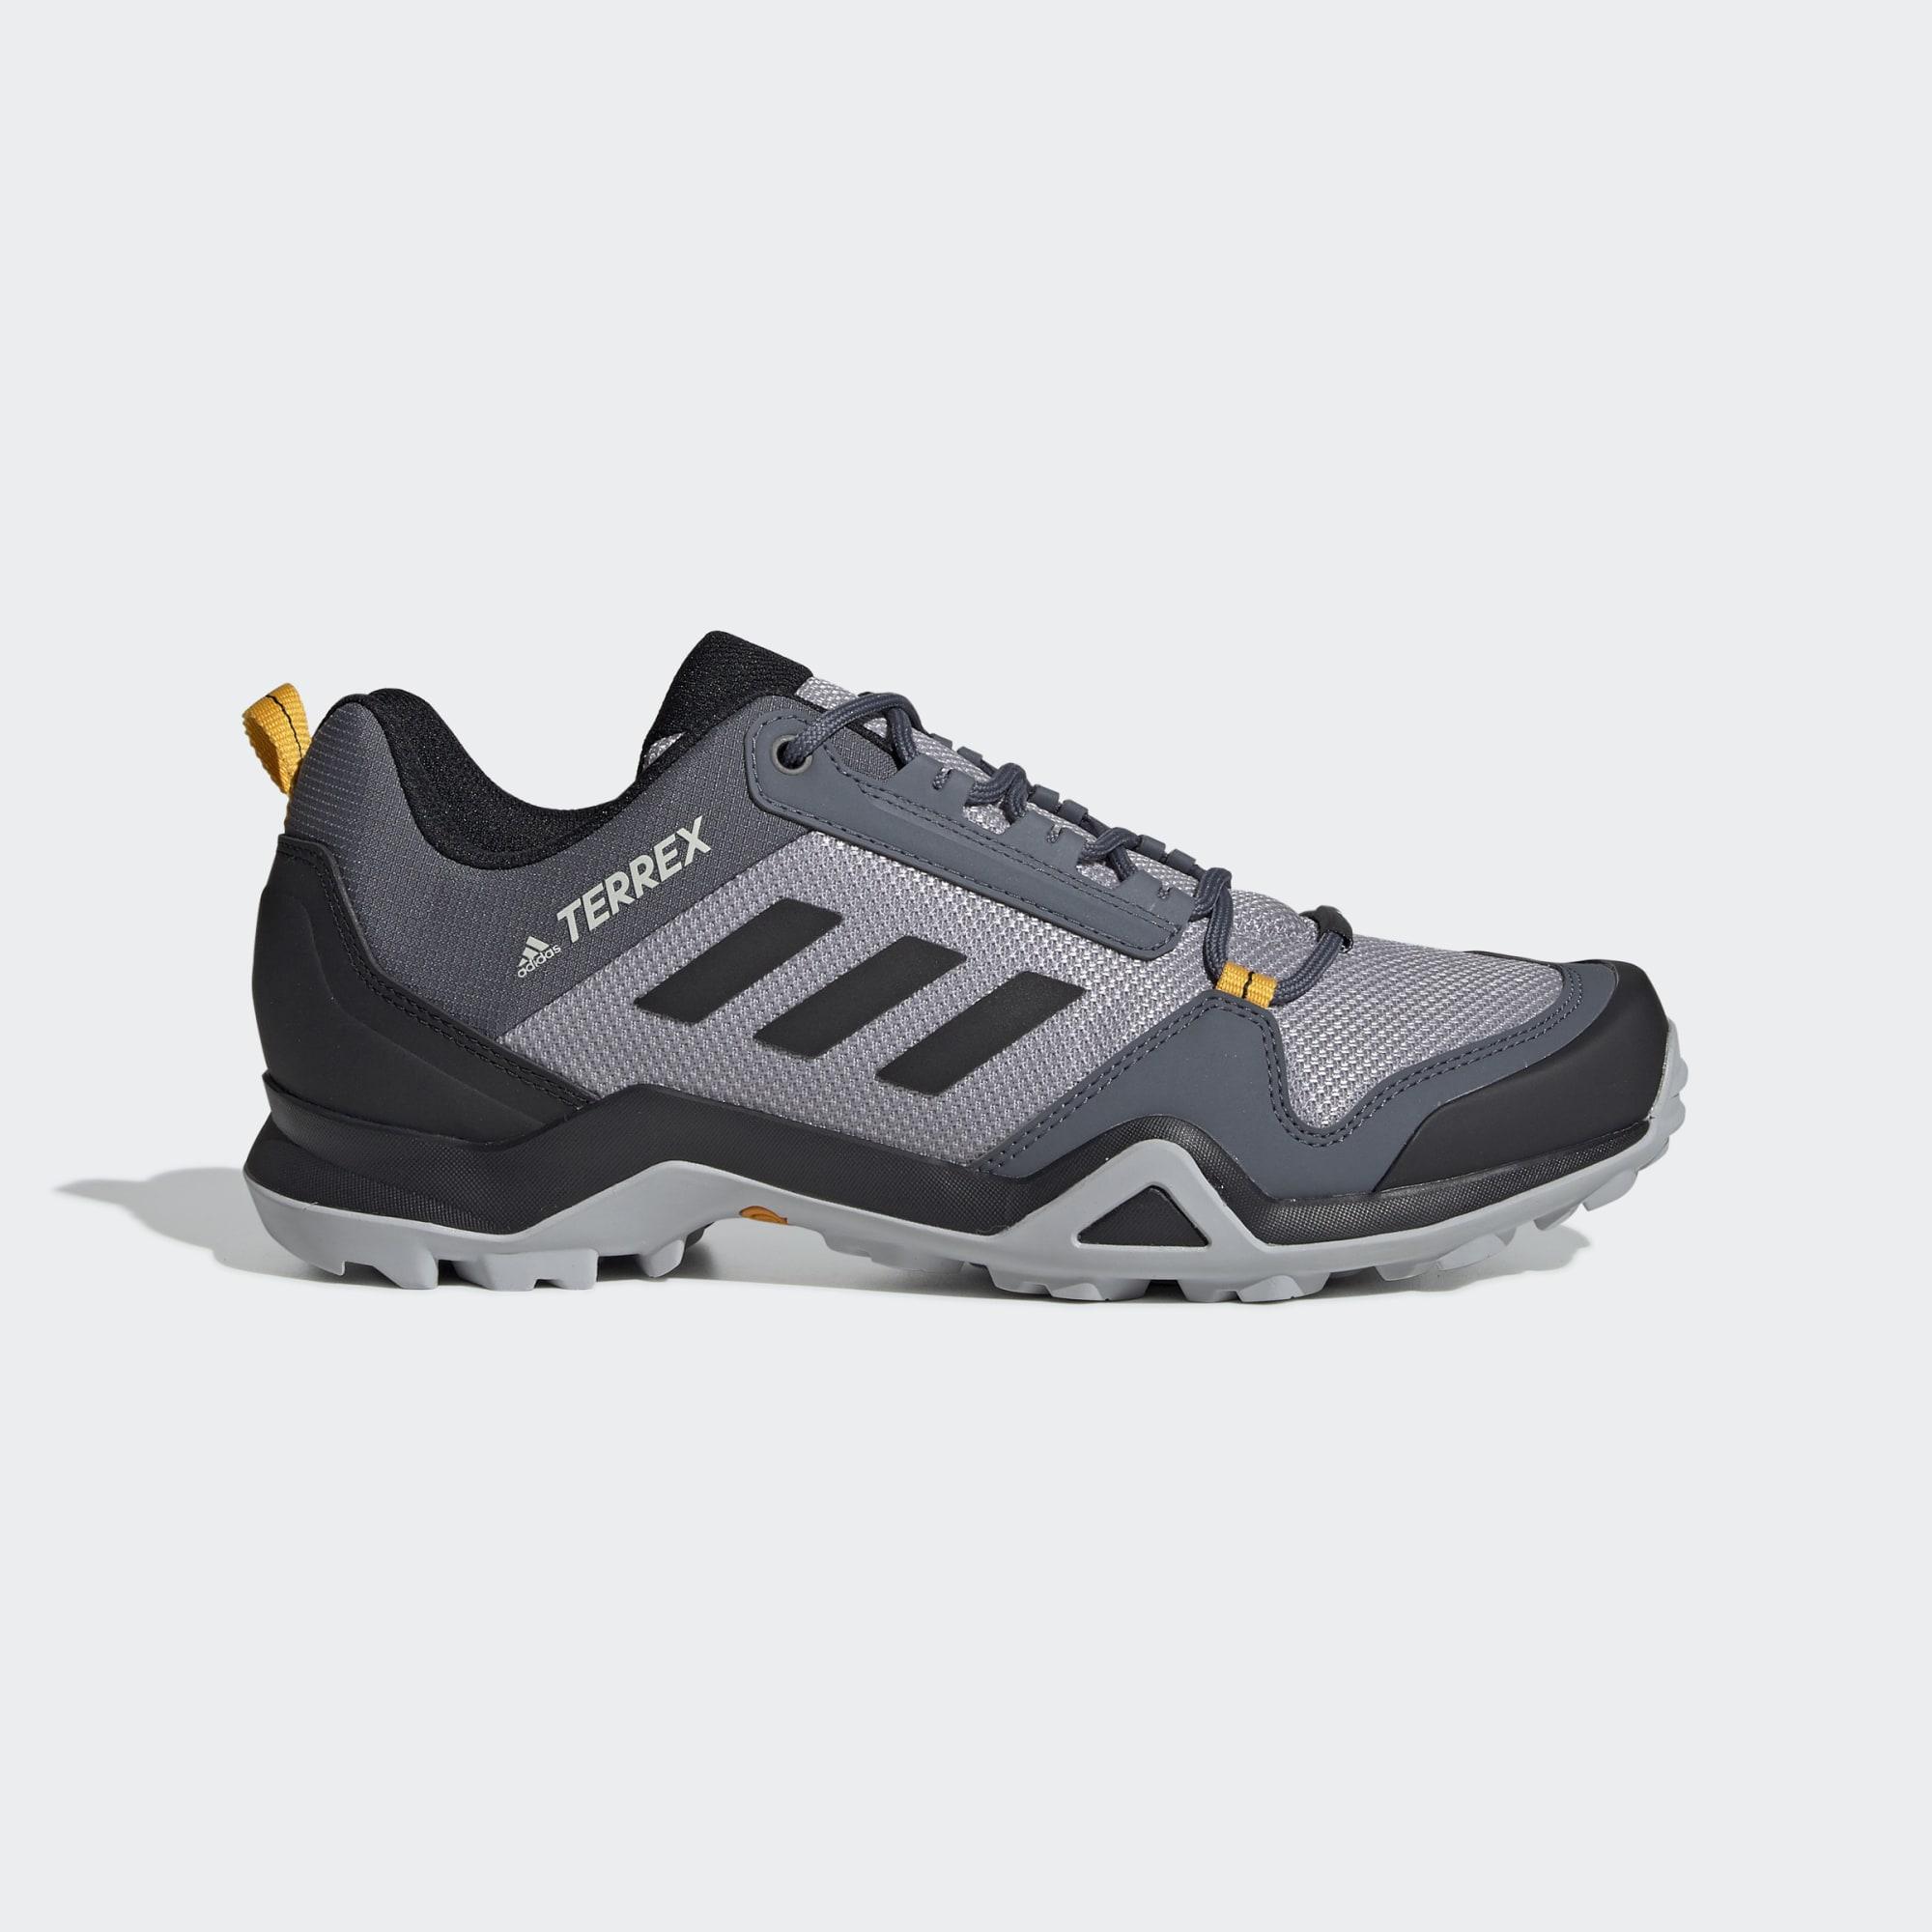 adidas Men's Terrex Ax3 Walking Shoes - £44.60 with code at Adidas Shop